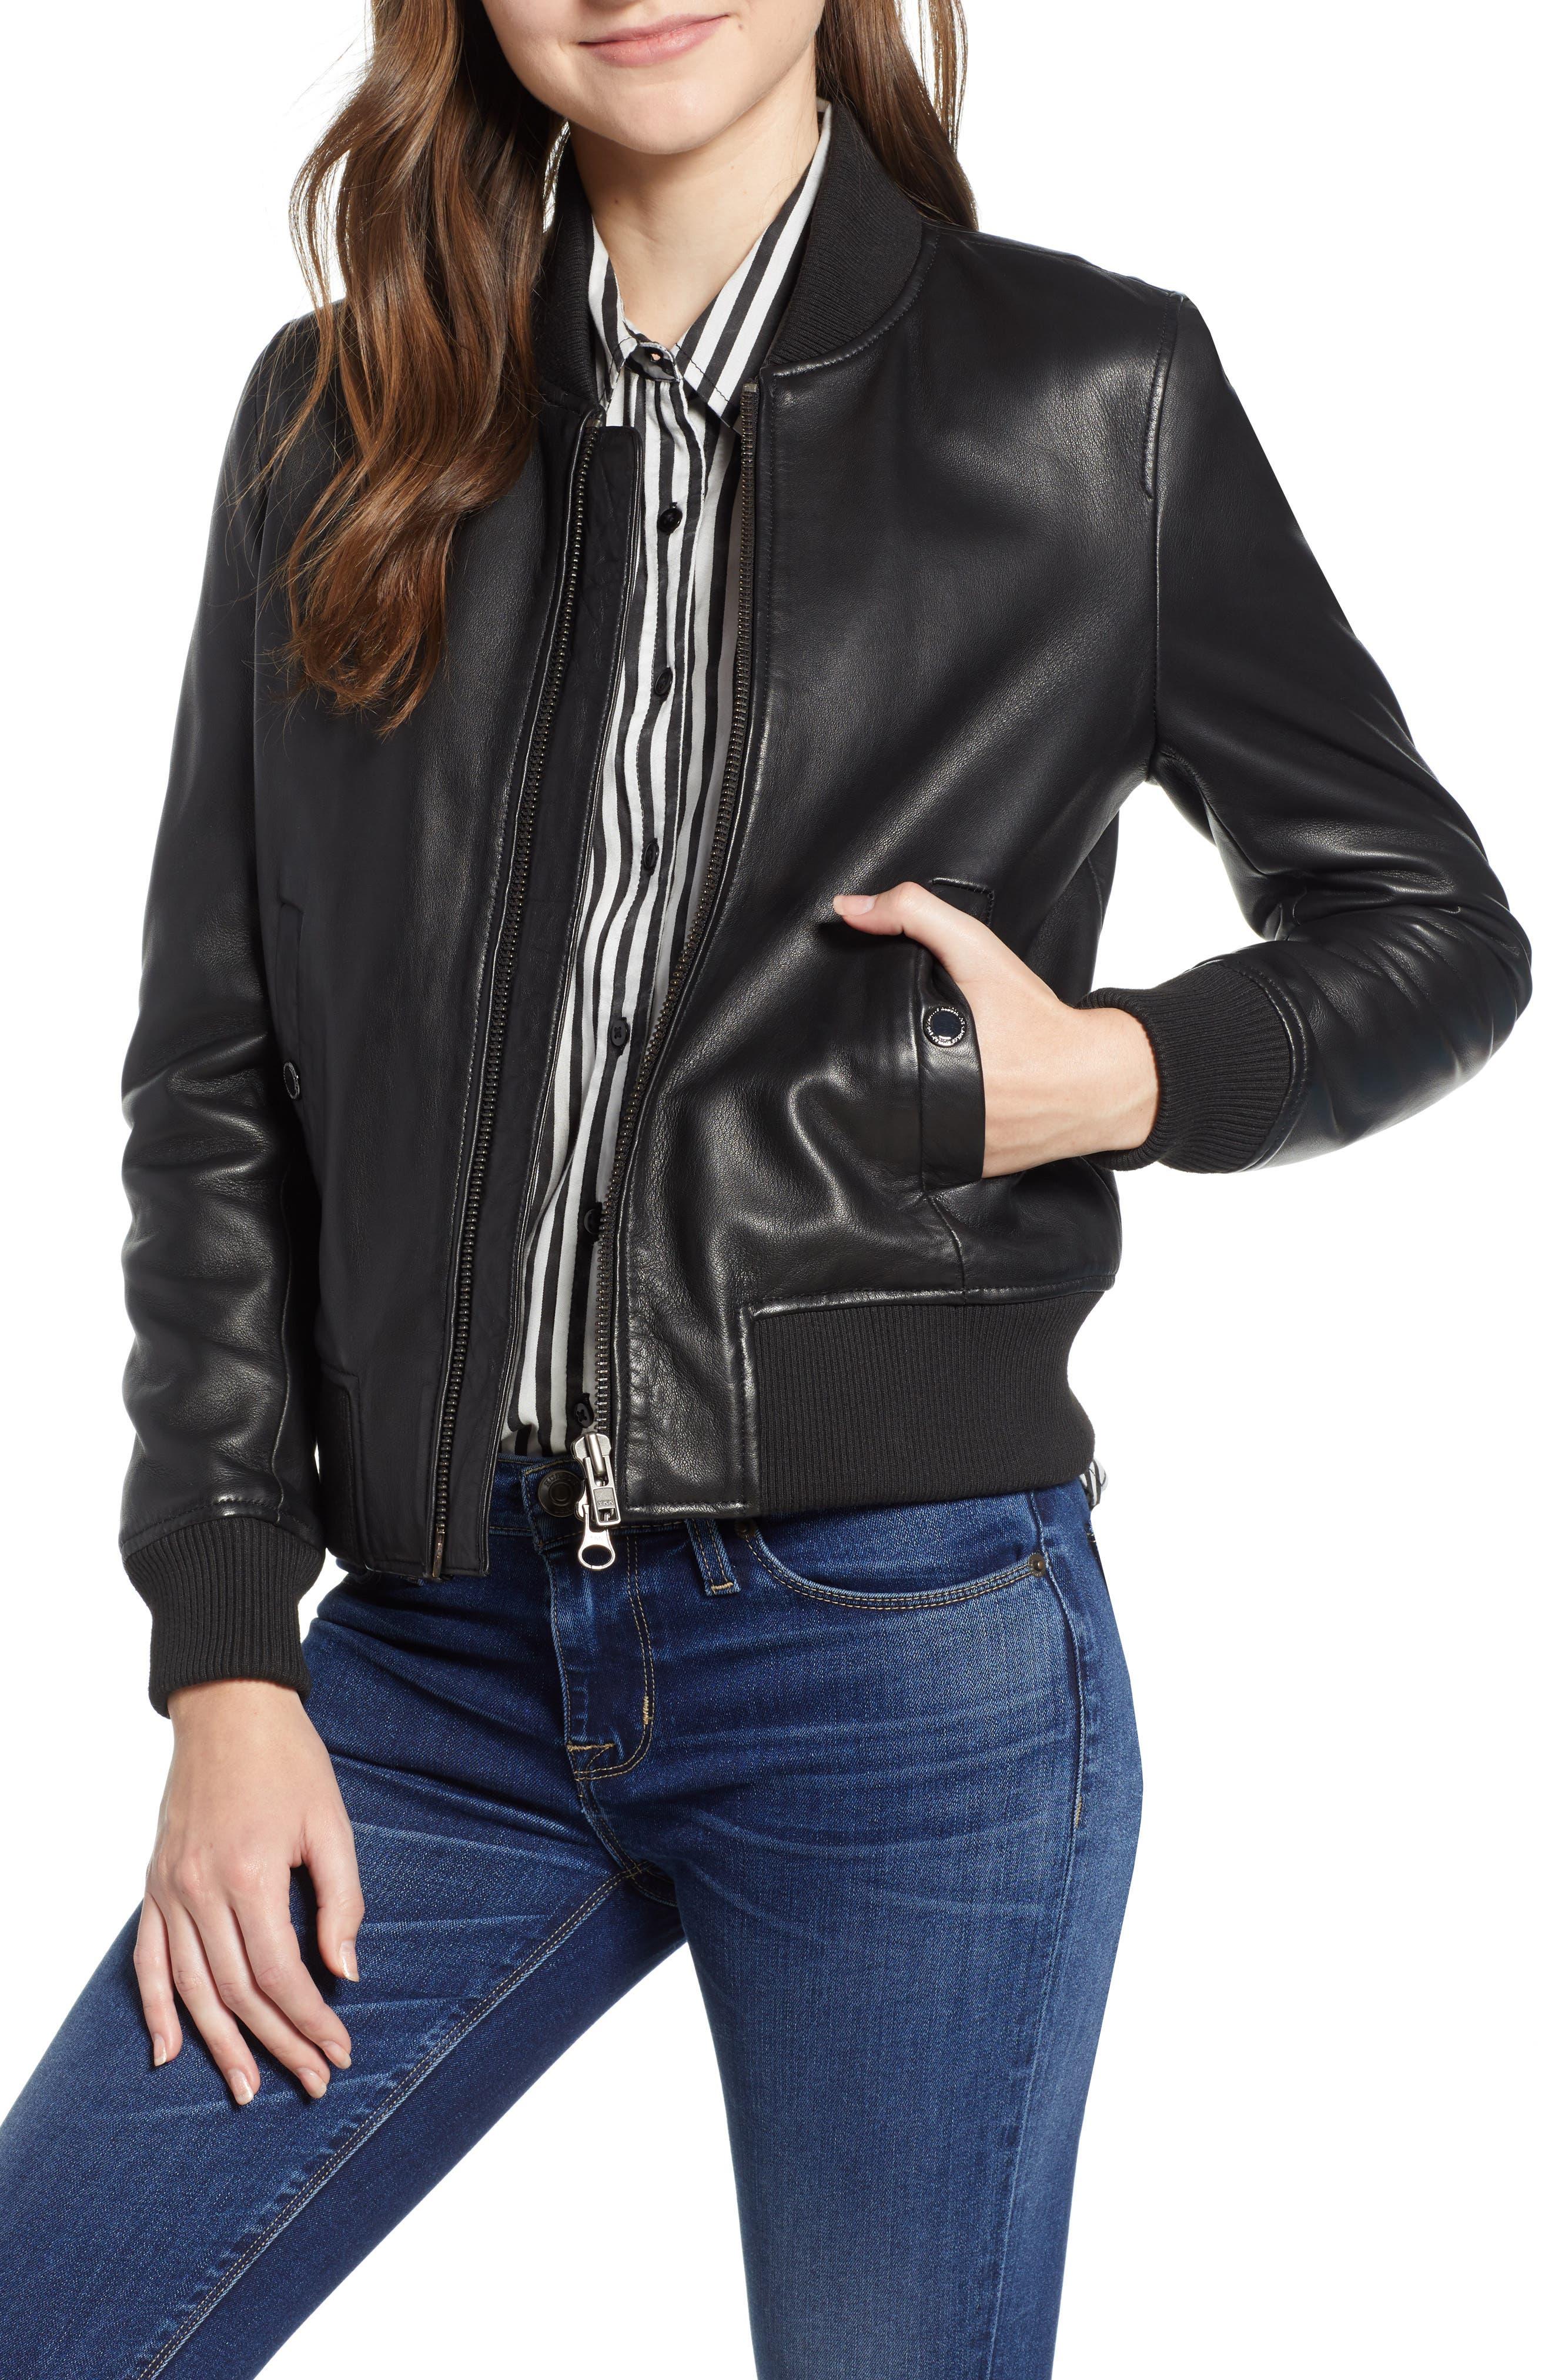 HUDSON Zip-Front Leather Bomber Jacket in Black